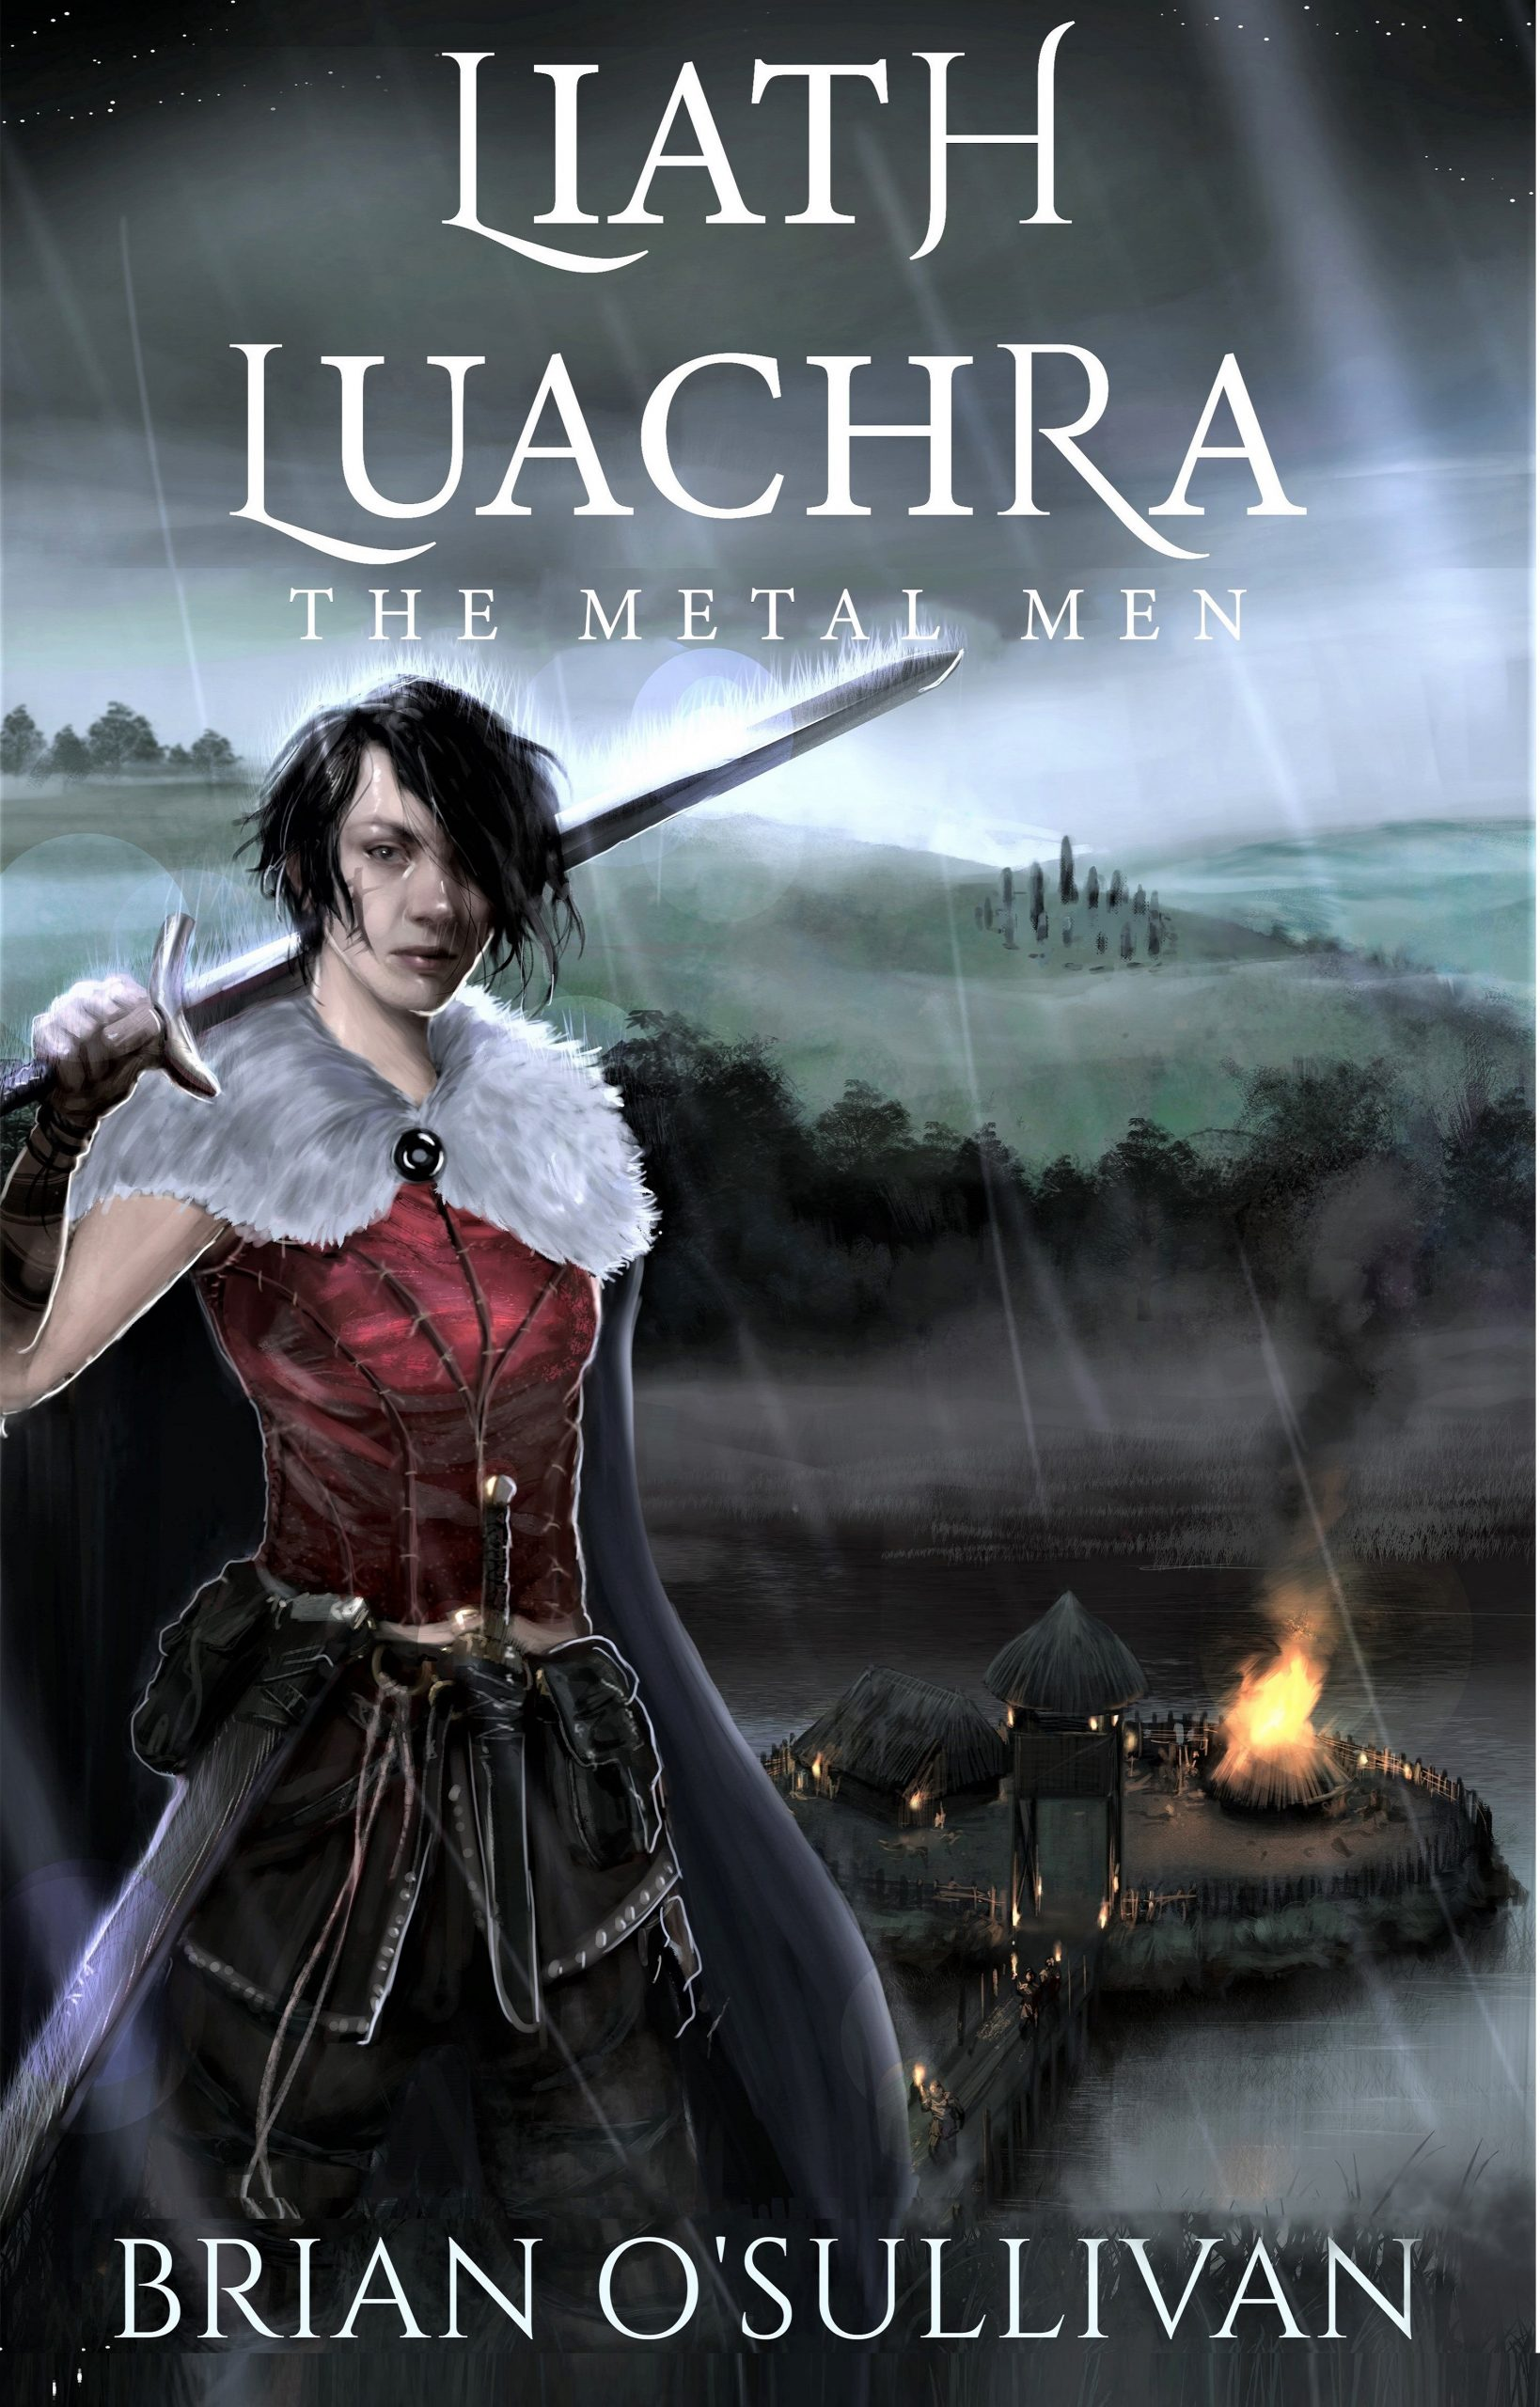 Liath Luachra: The Metal Men